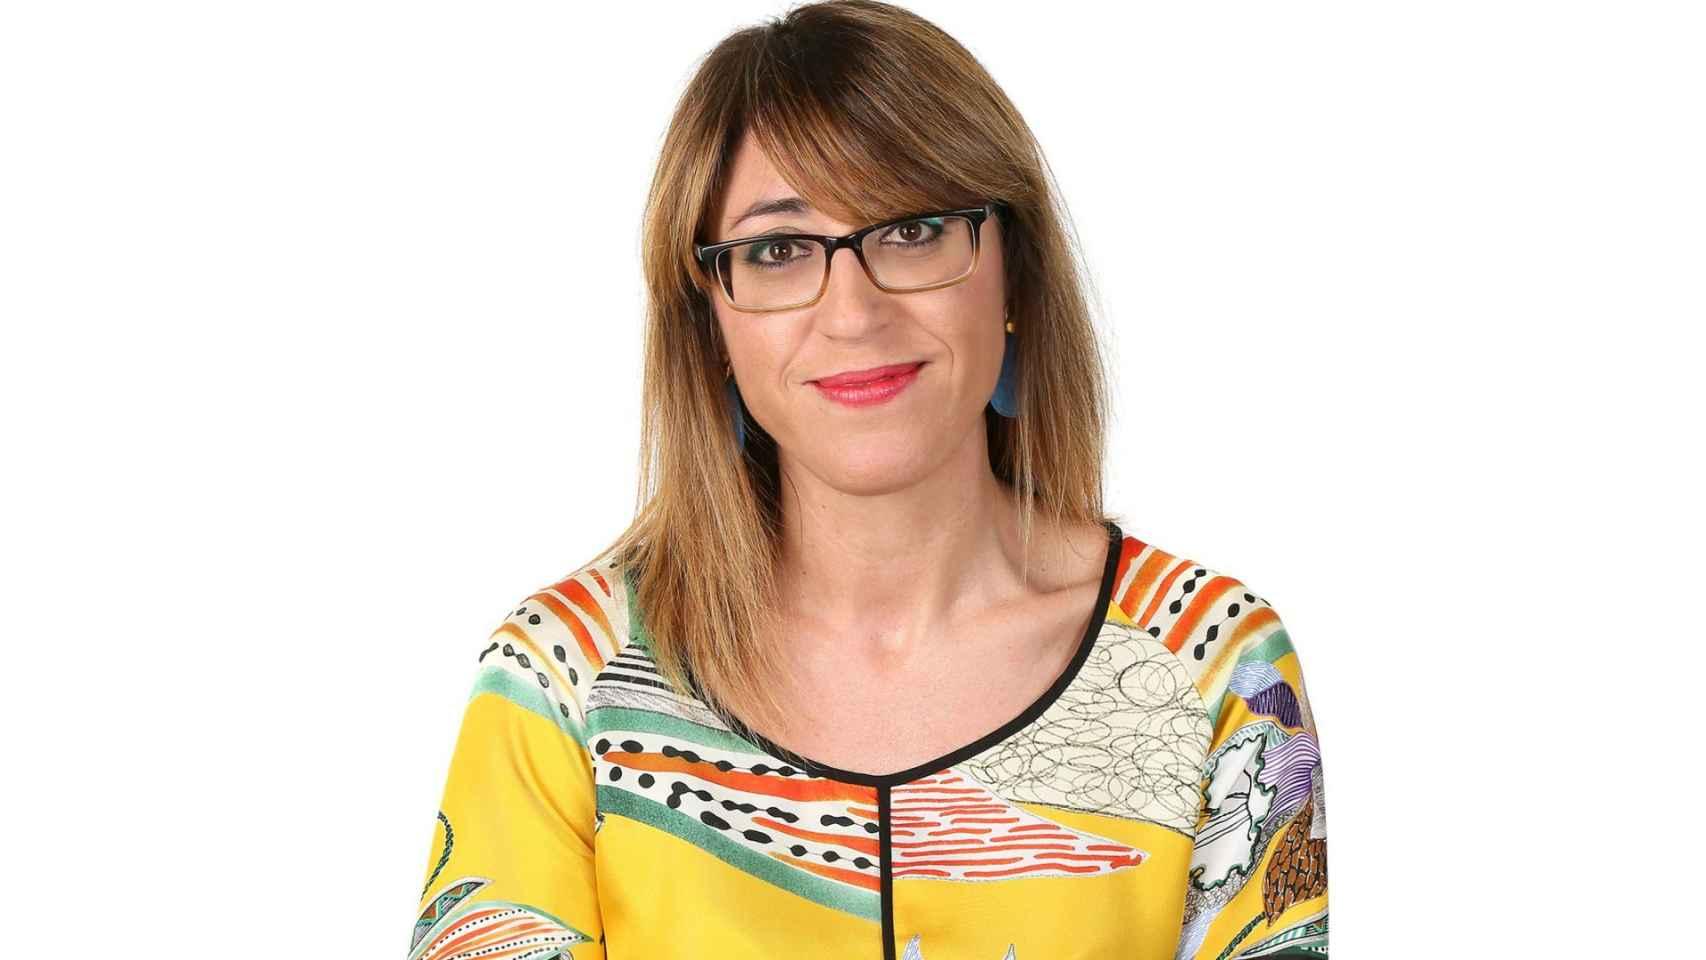 La concejal de Elche y diputada provincial del PSOE, Patricia Macià.